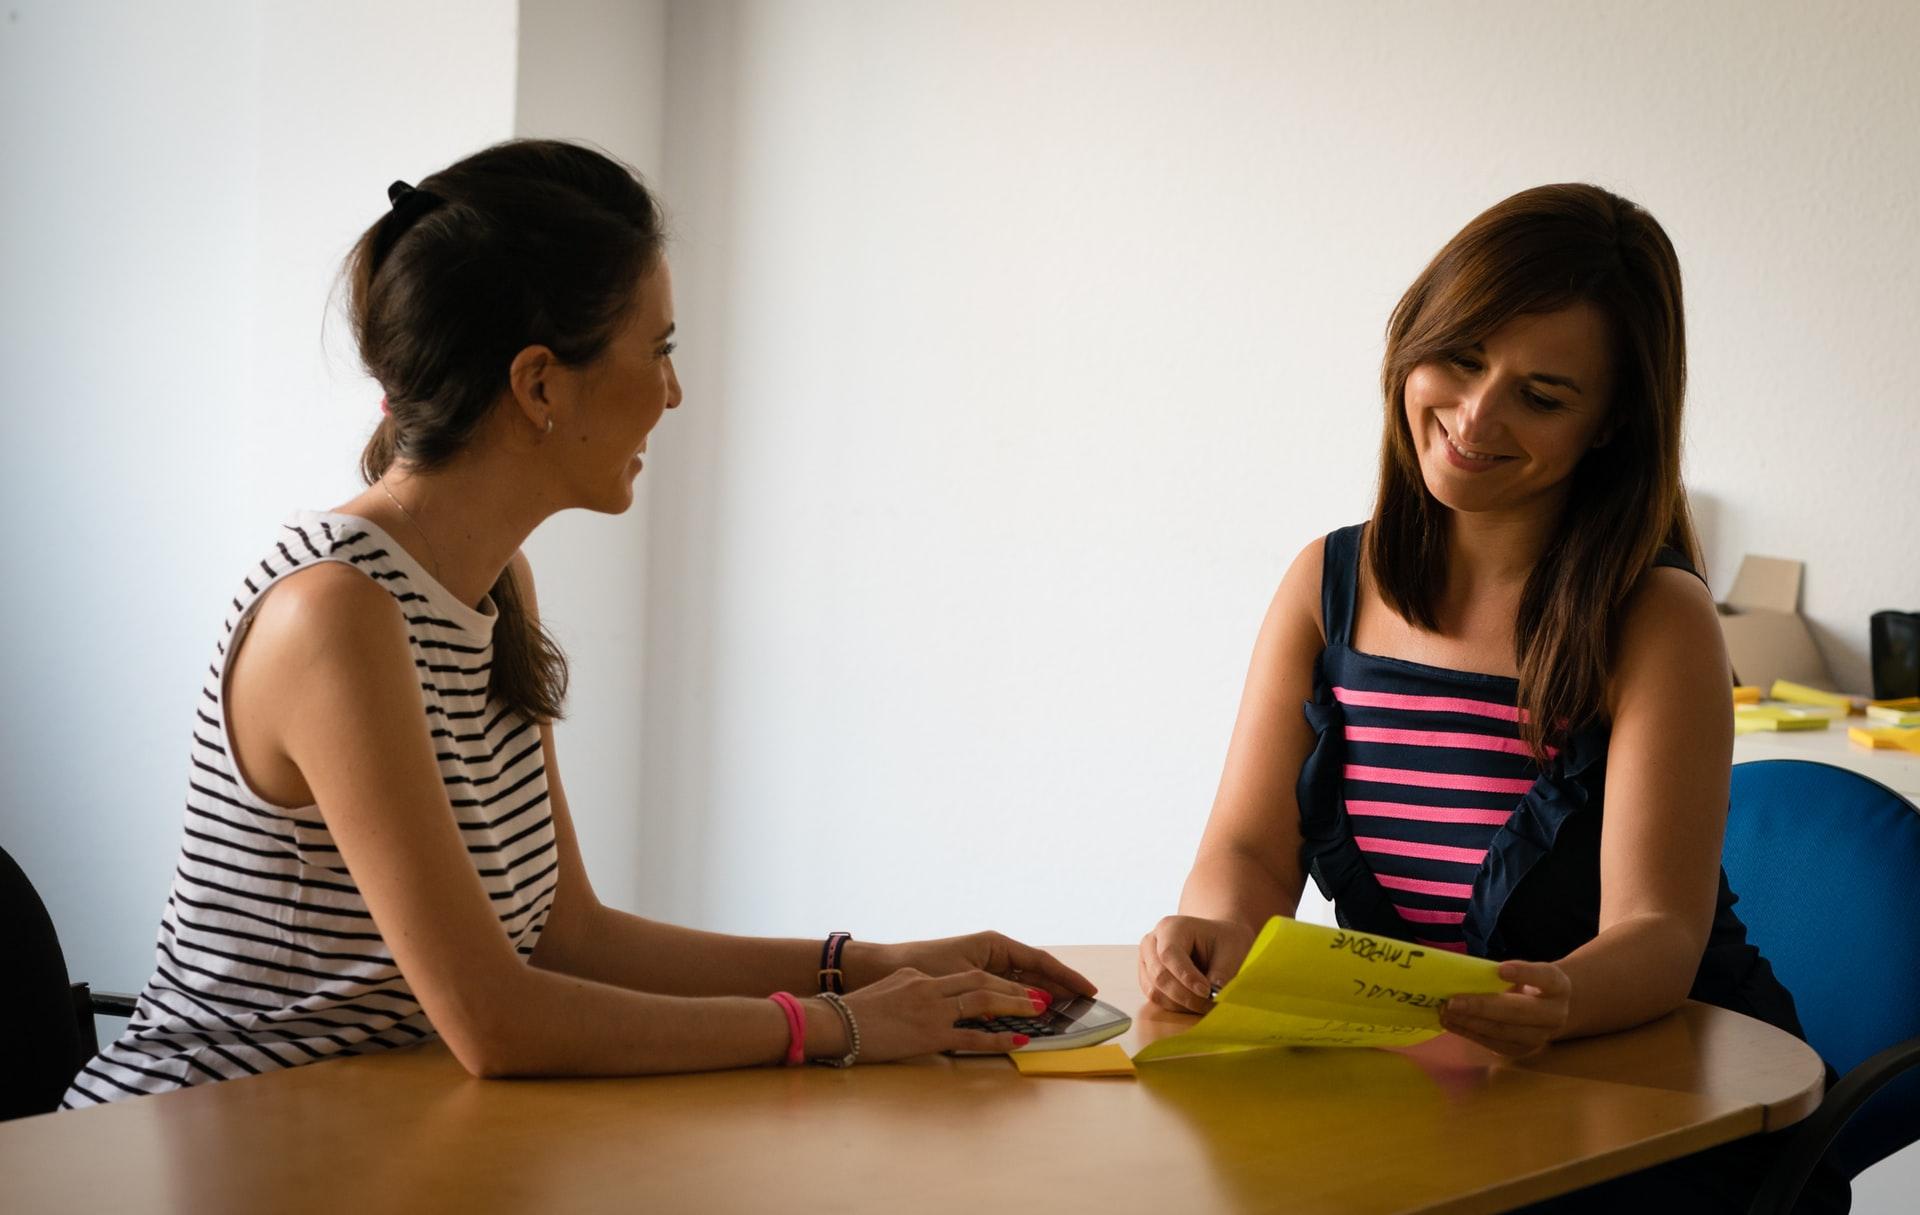 Two women sit at a desk.